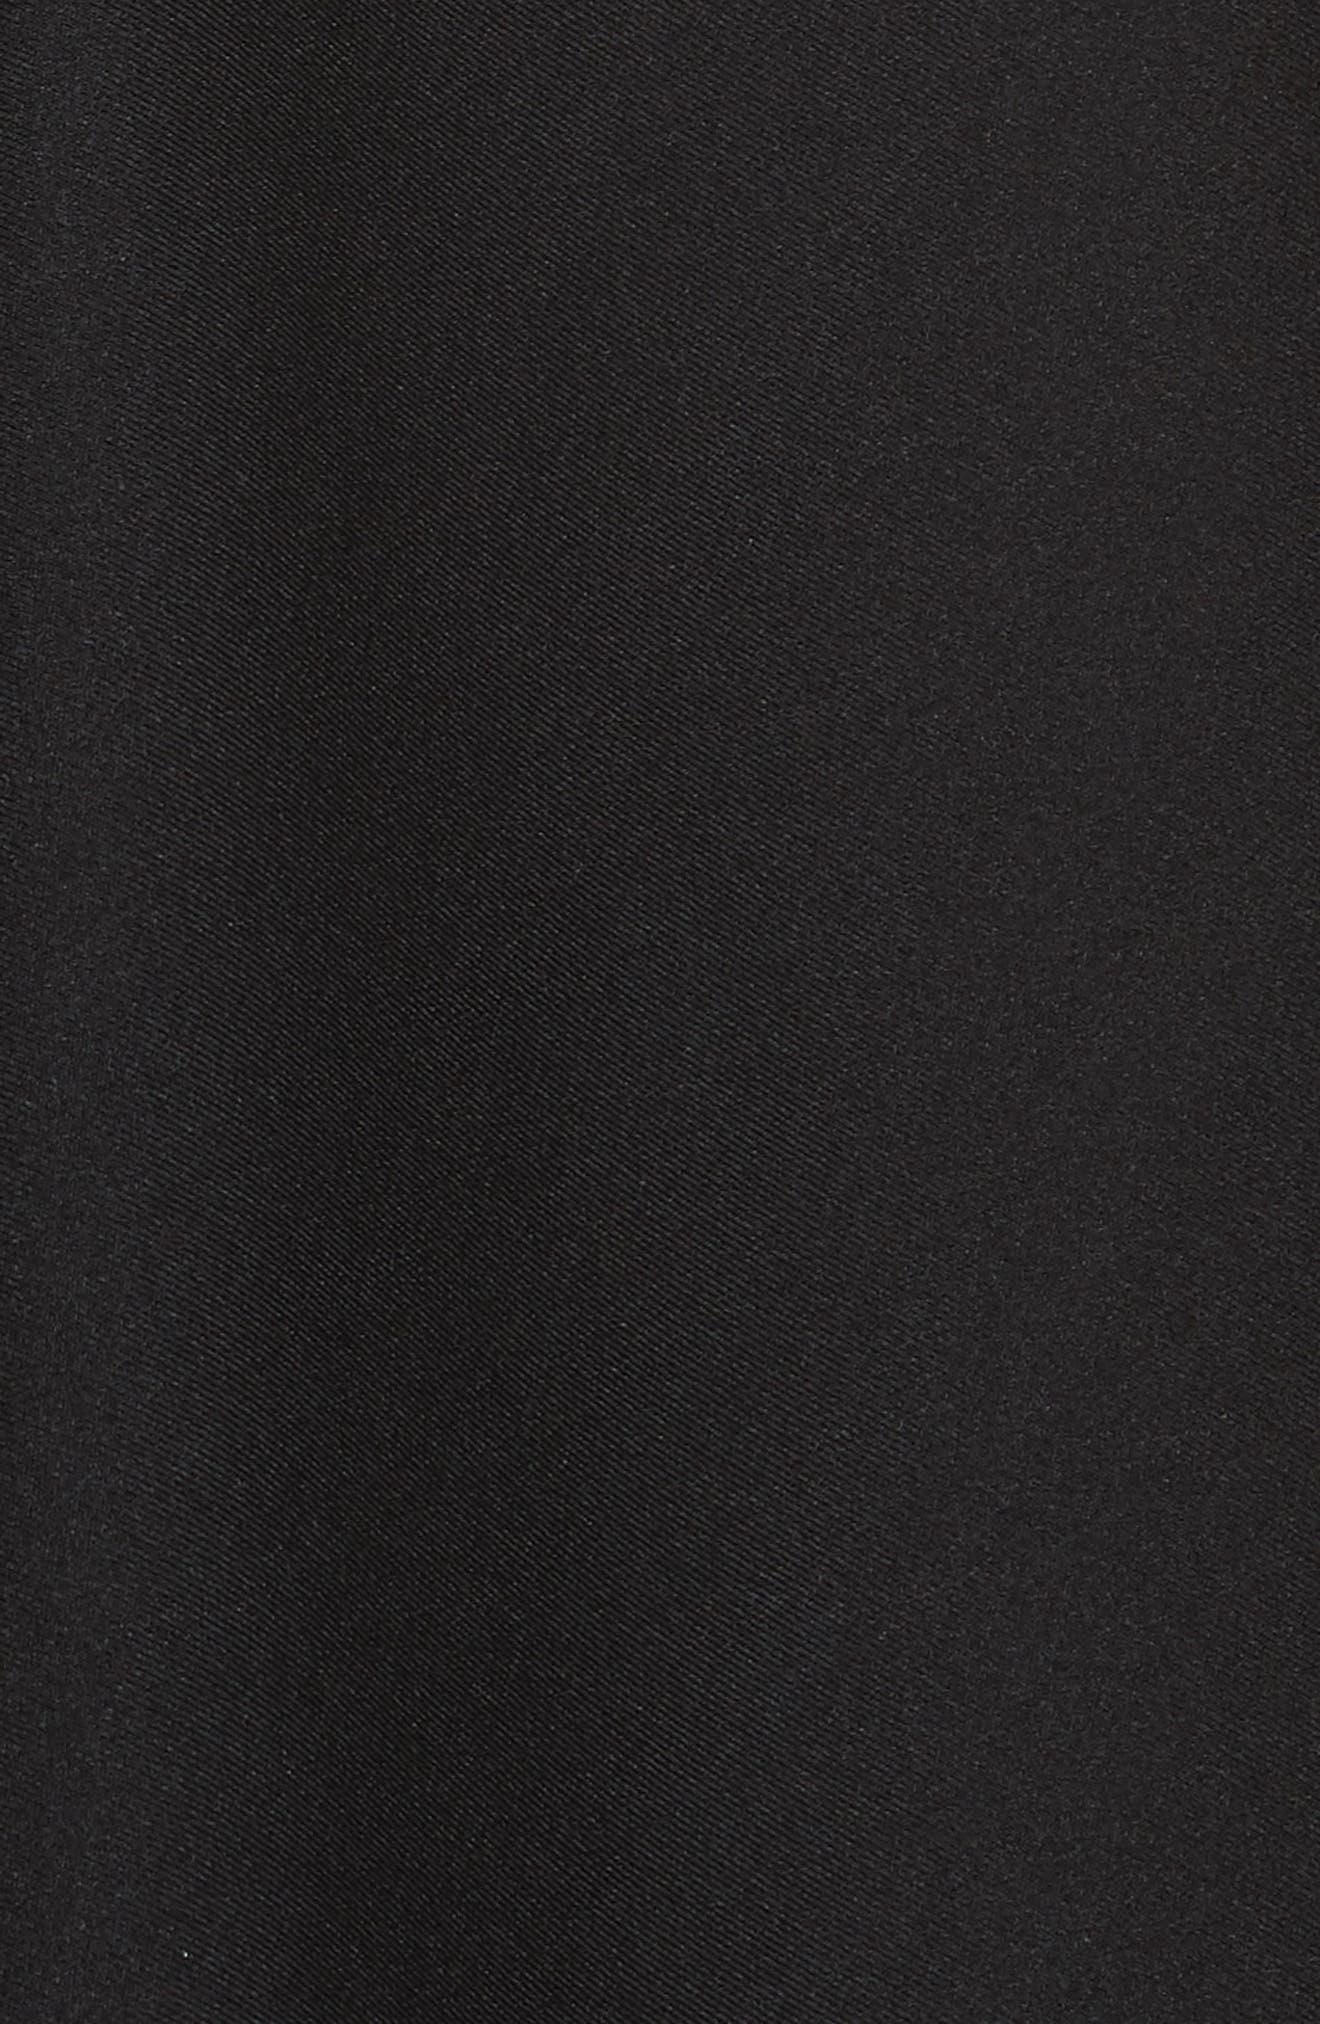 Logo Waist Cutout Fit & Flare Dress,                             Alternate thumbnail 5, color,                             BLACK